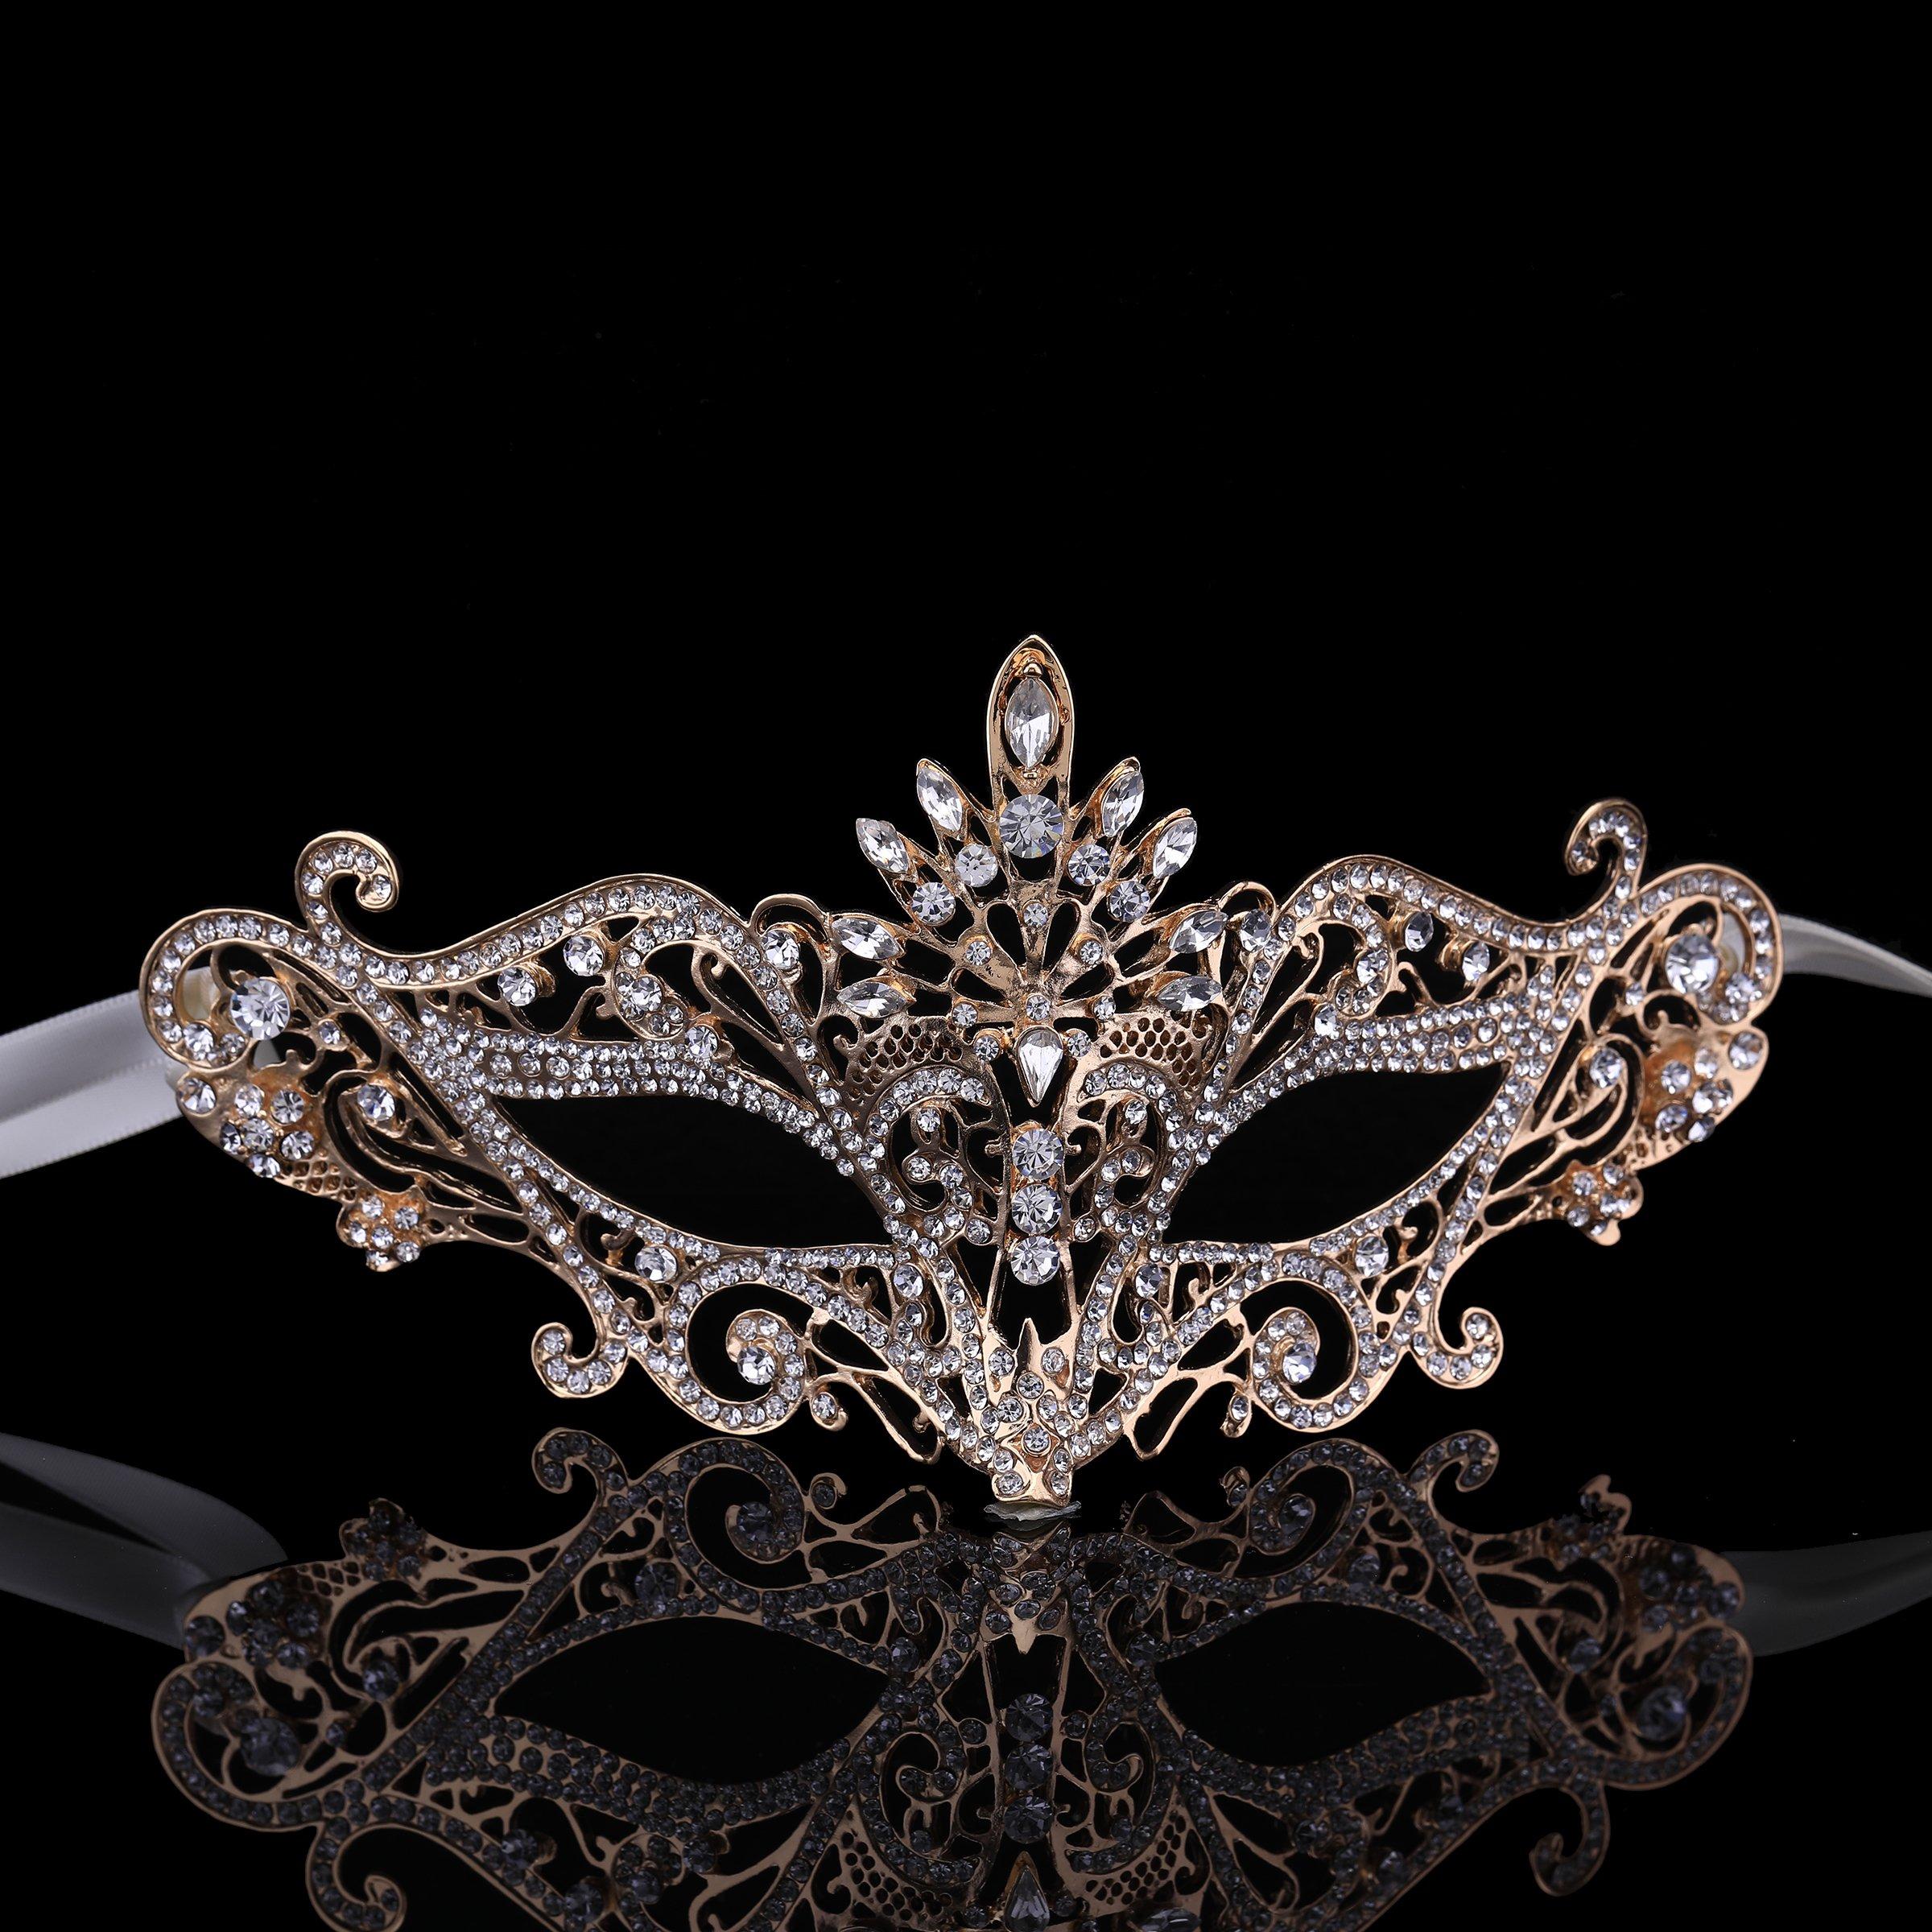 FUMUD Luxury Full Rhinestone Crystal Venetian Masquerade Ball Women Mask for Party Wedding Accessories (Gold)